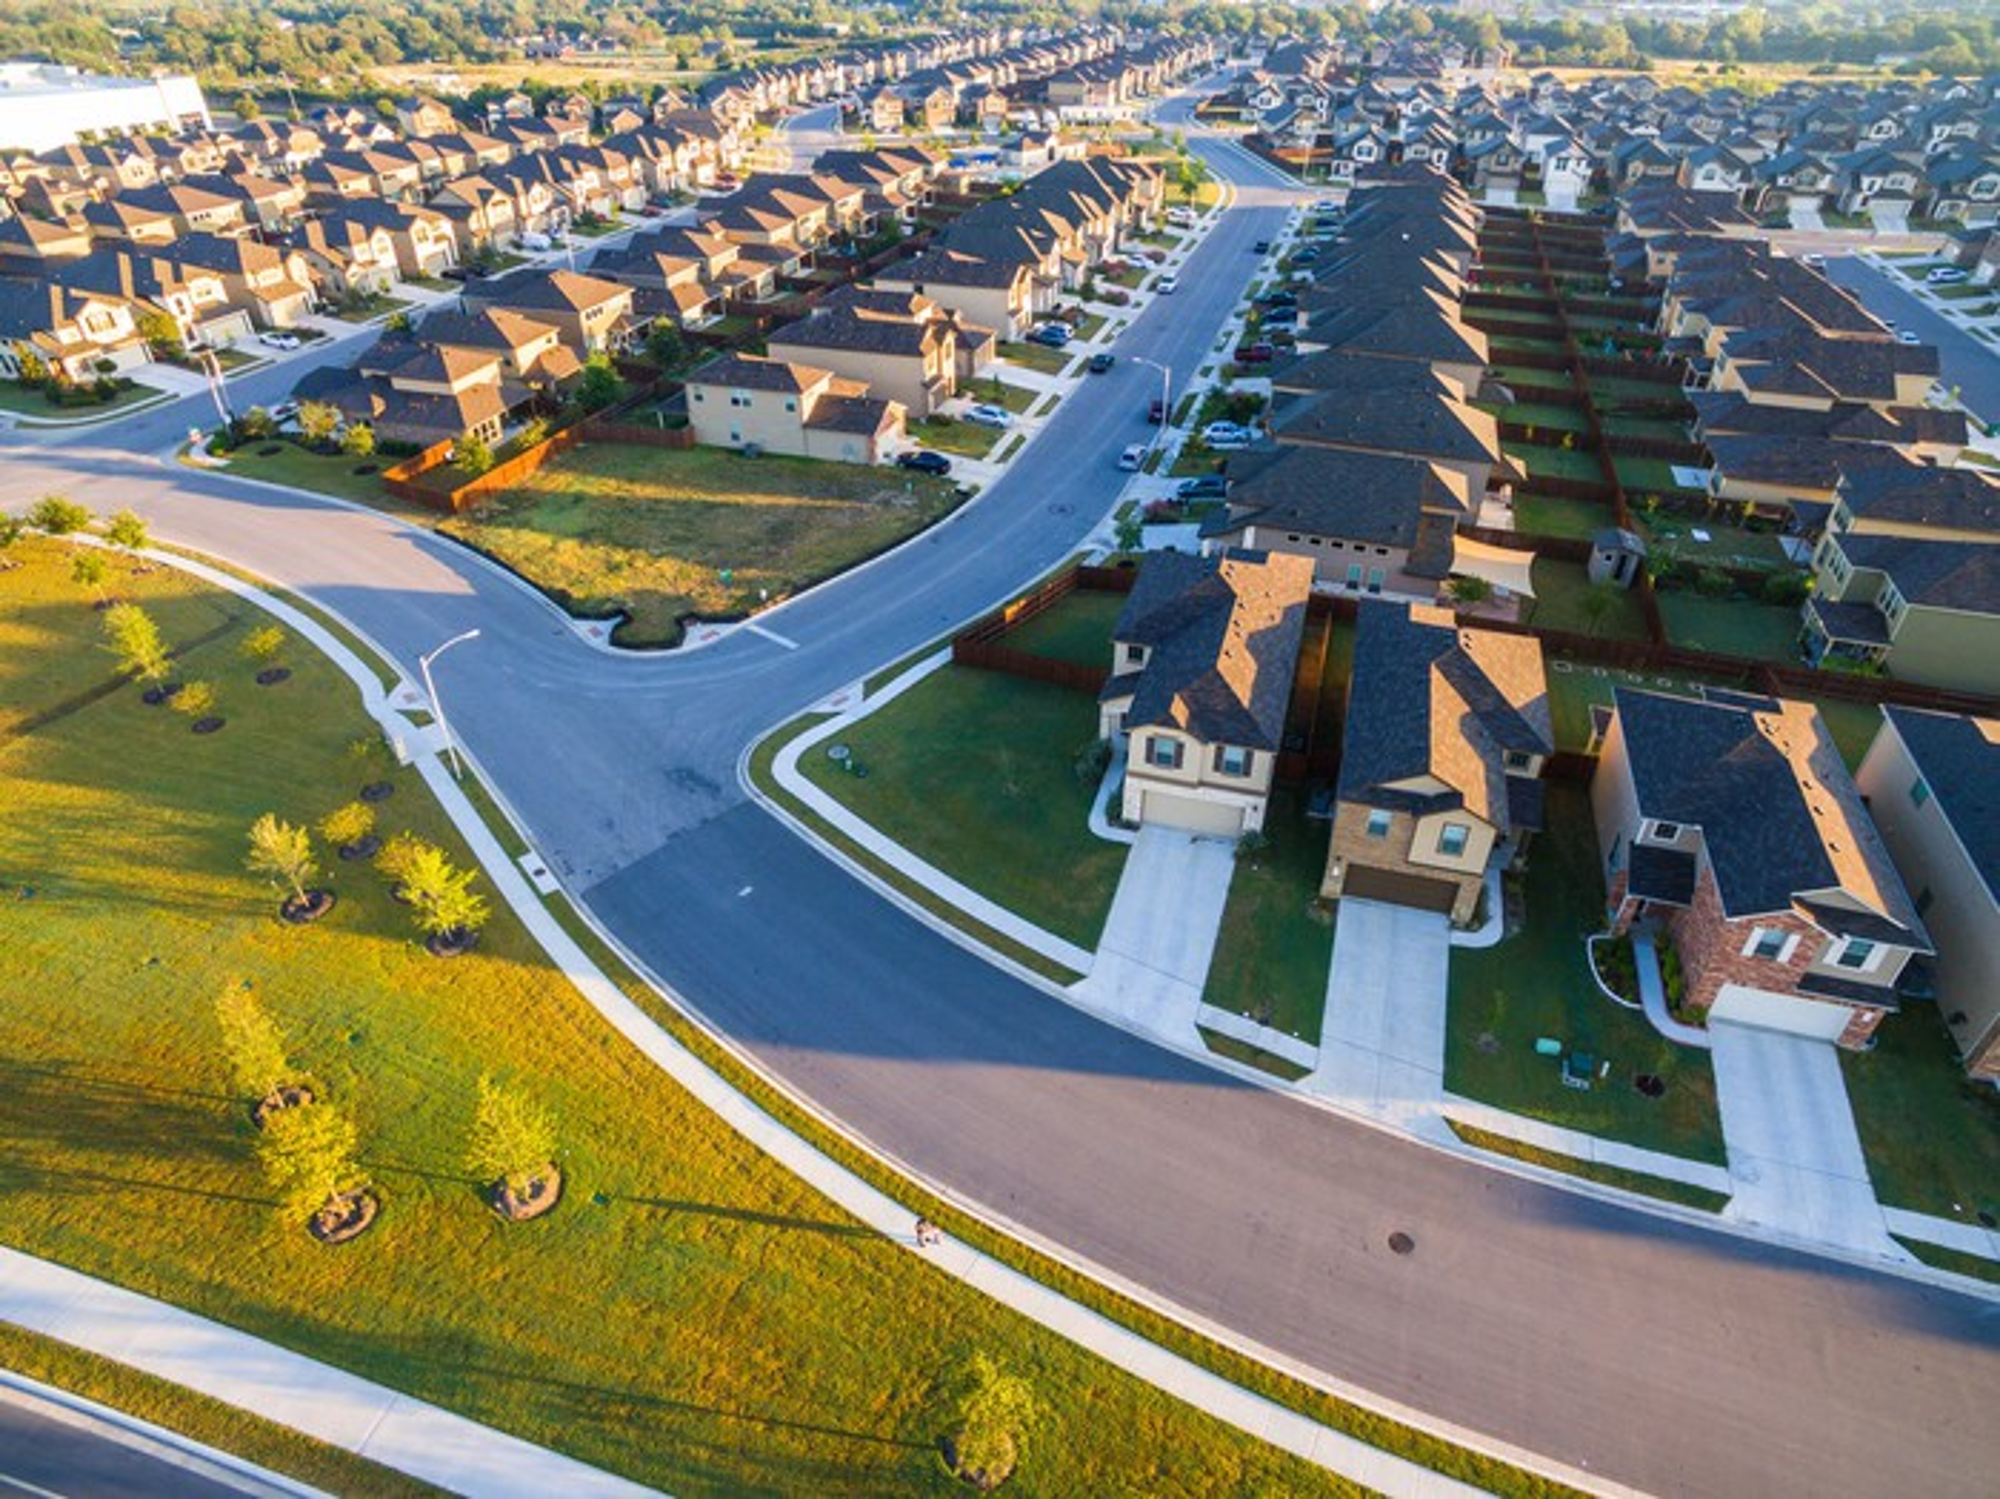 Overhead shot of housing community